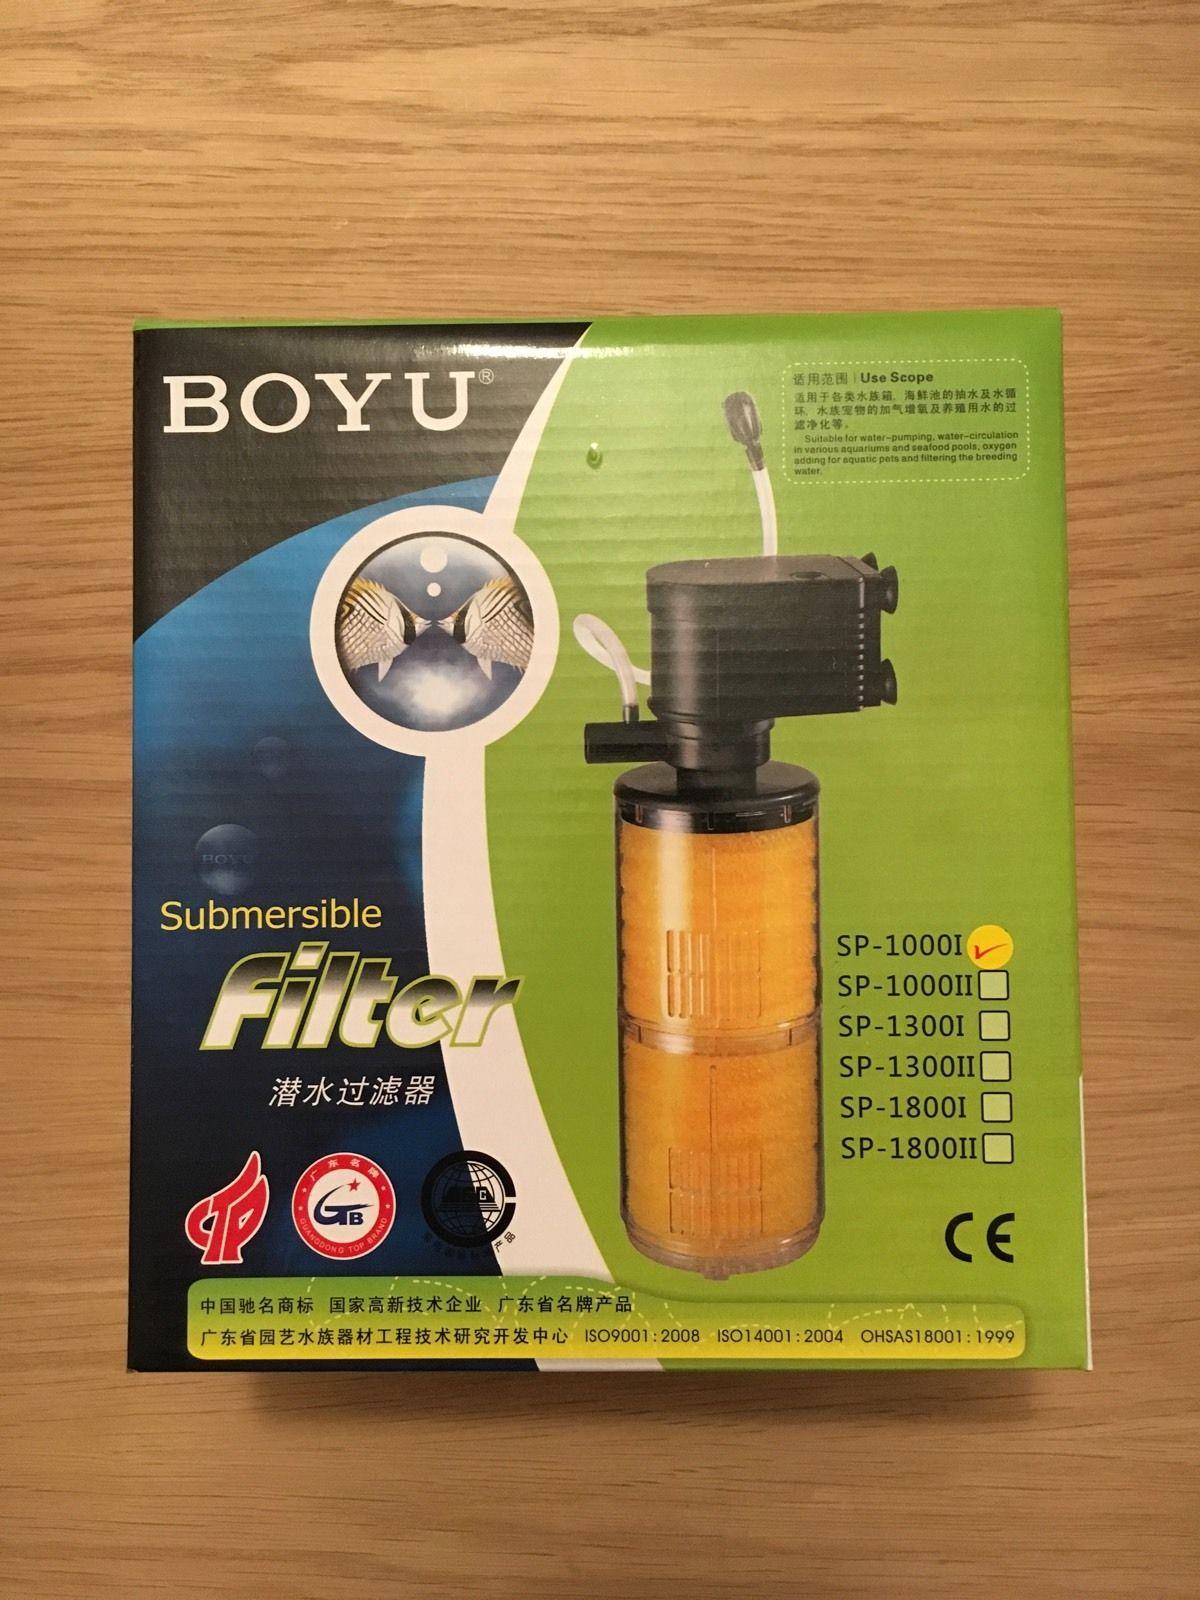 Boyu aquarium fish tank external filter canister ef 05 - Boyu Sp 1000i Submersible Aquarium Filter China Mainland